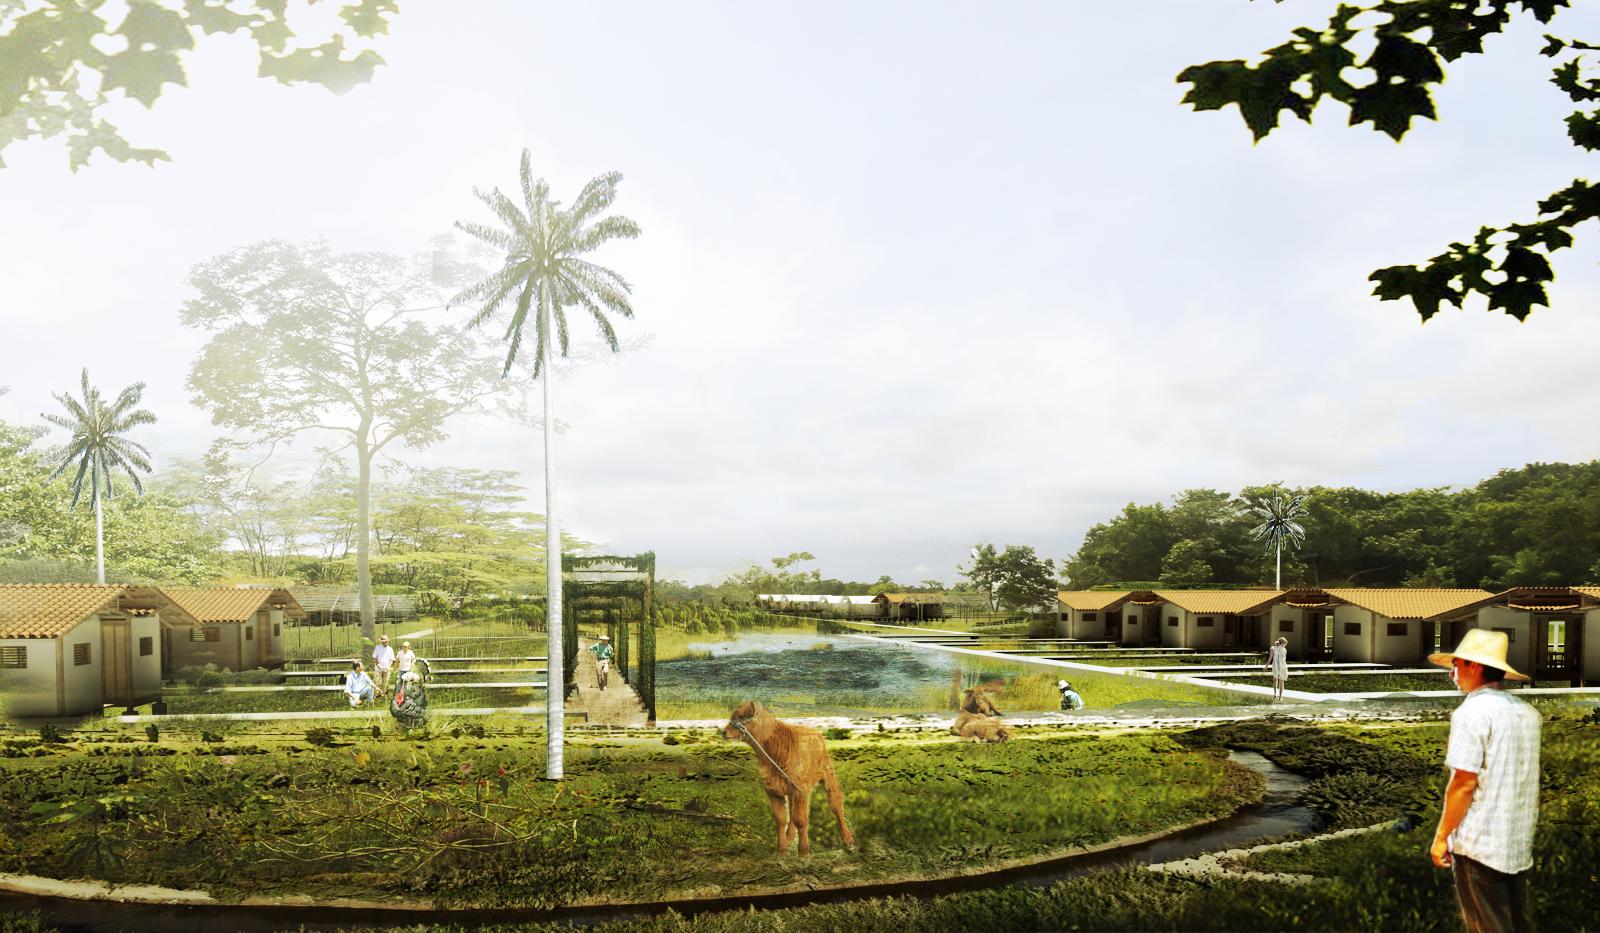 Guafilla, agrocentro + asociación: vivienda. Image Courtesy of Equipo Primer Lugar